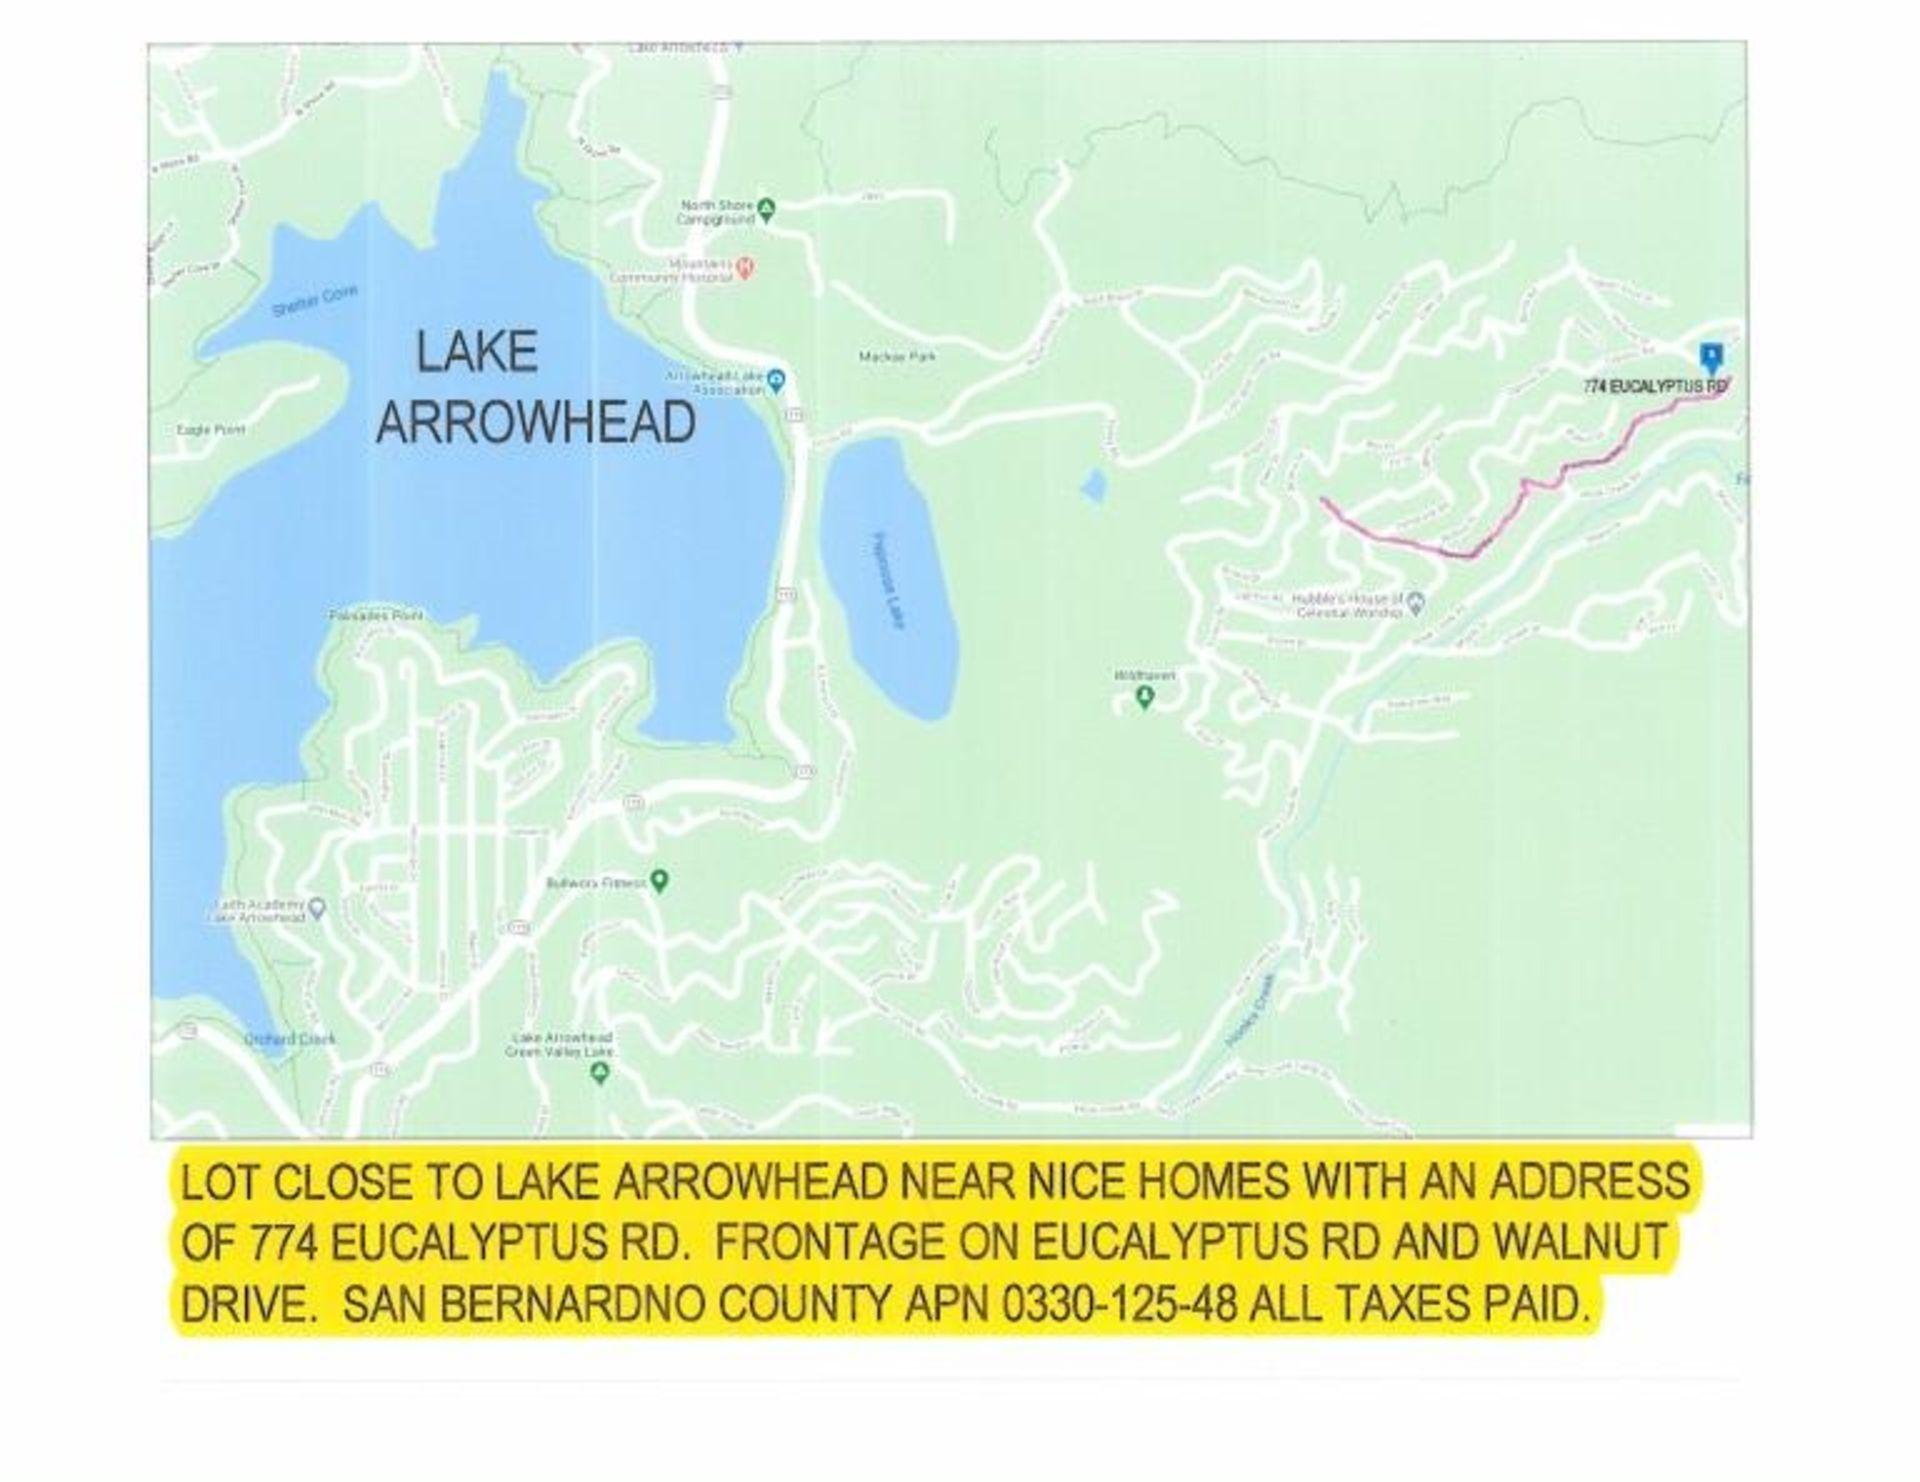 Lot 498 - 31.06' x 120.26' Vacant Parcel near Lake Arrowhead